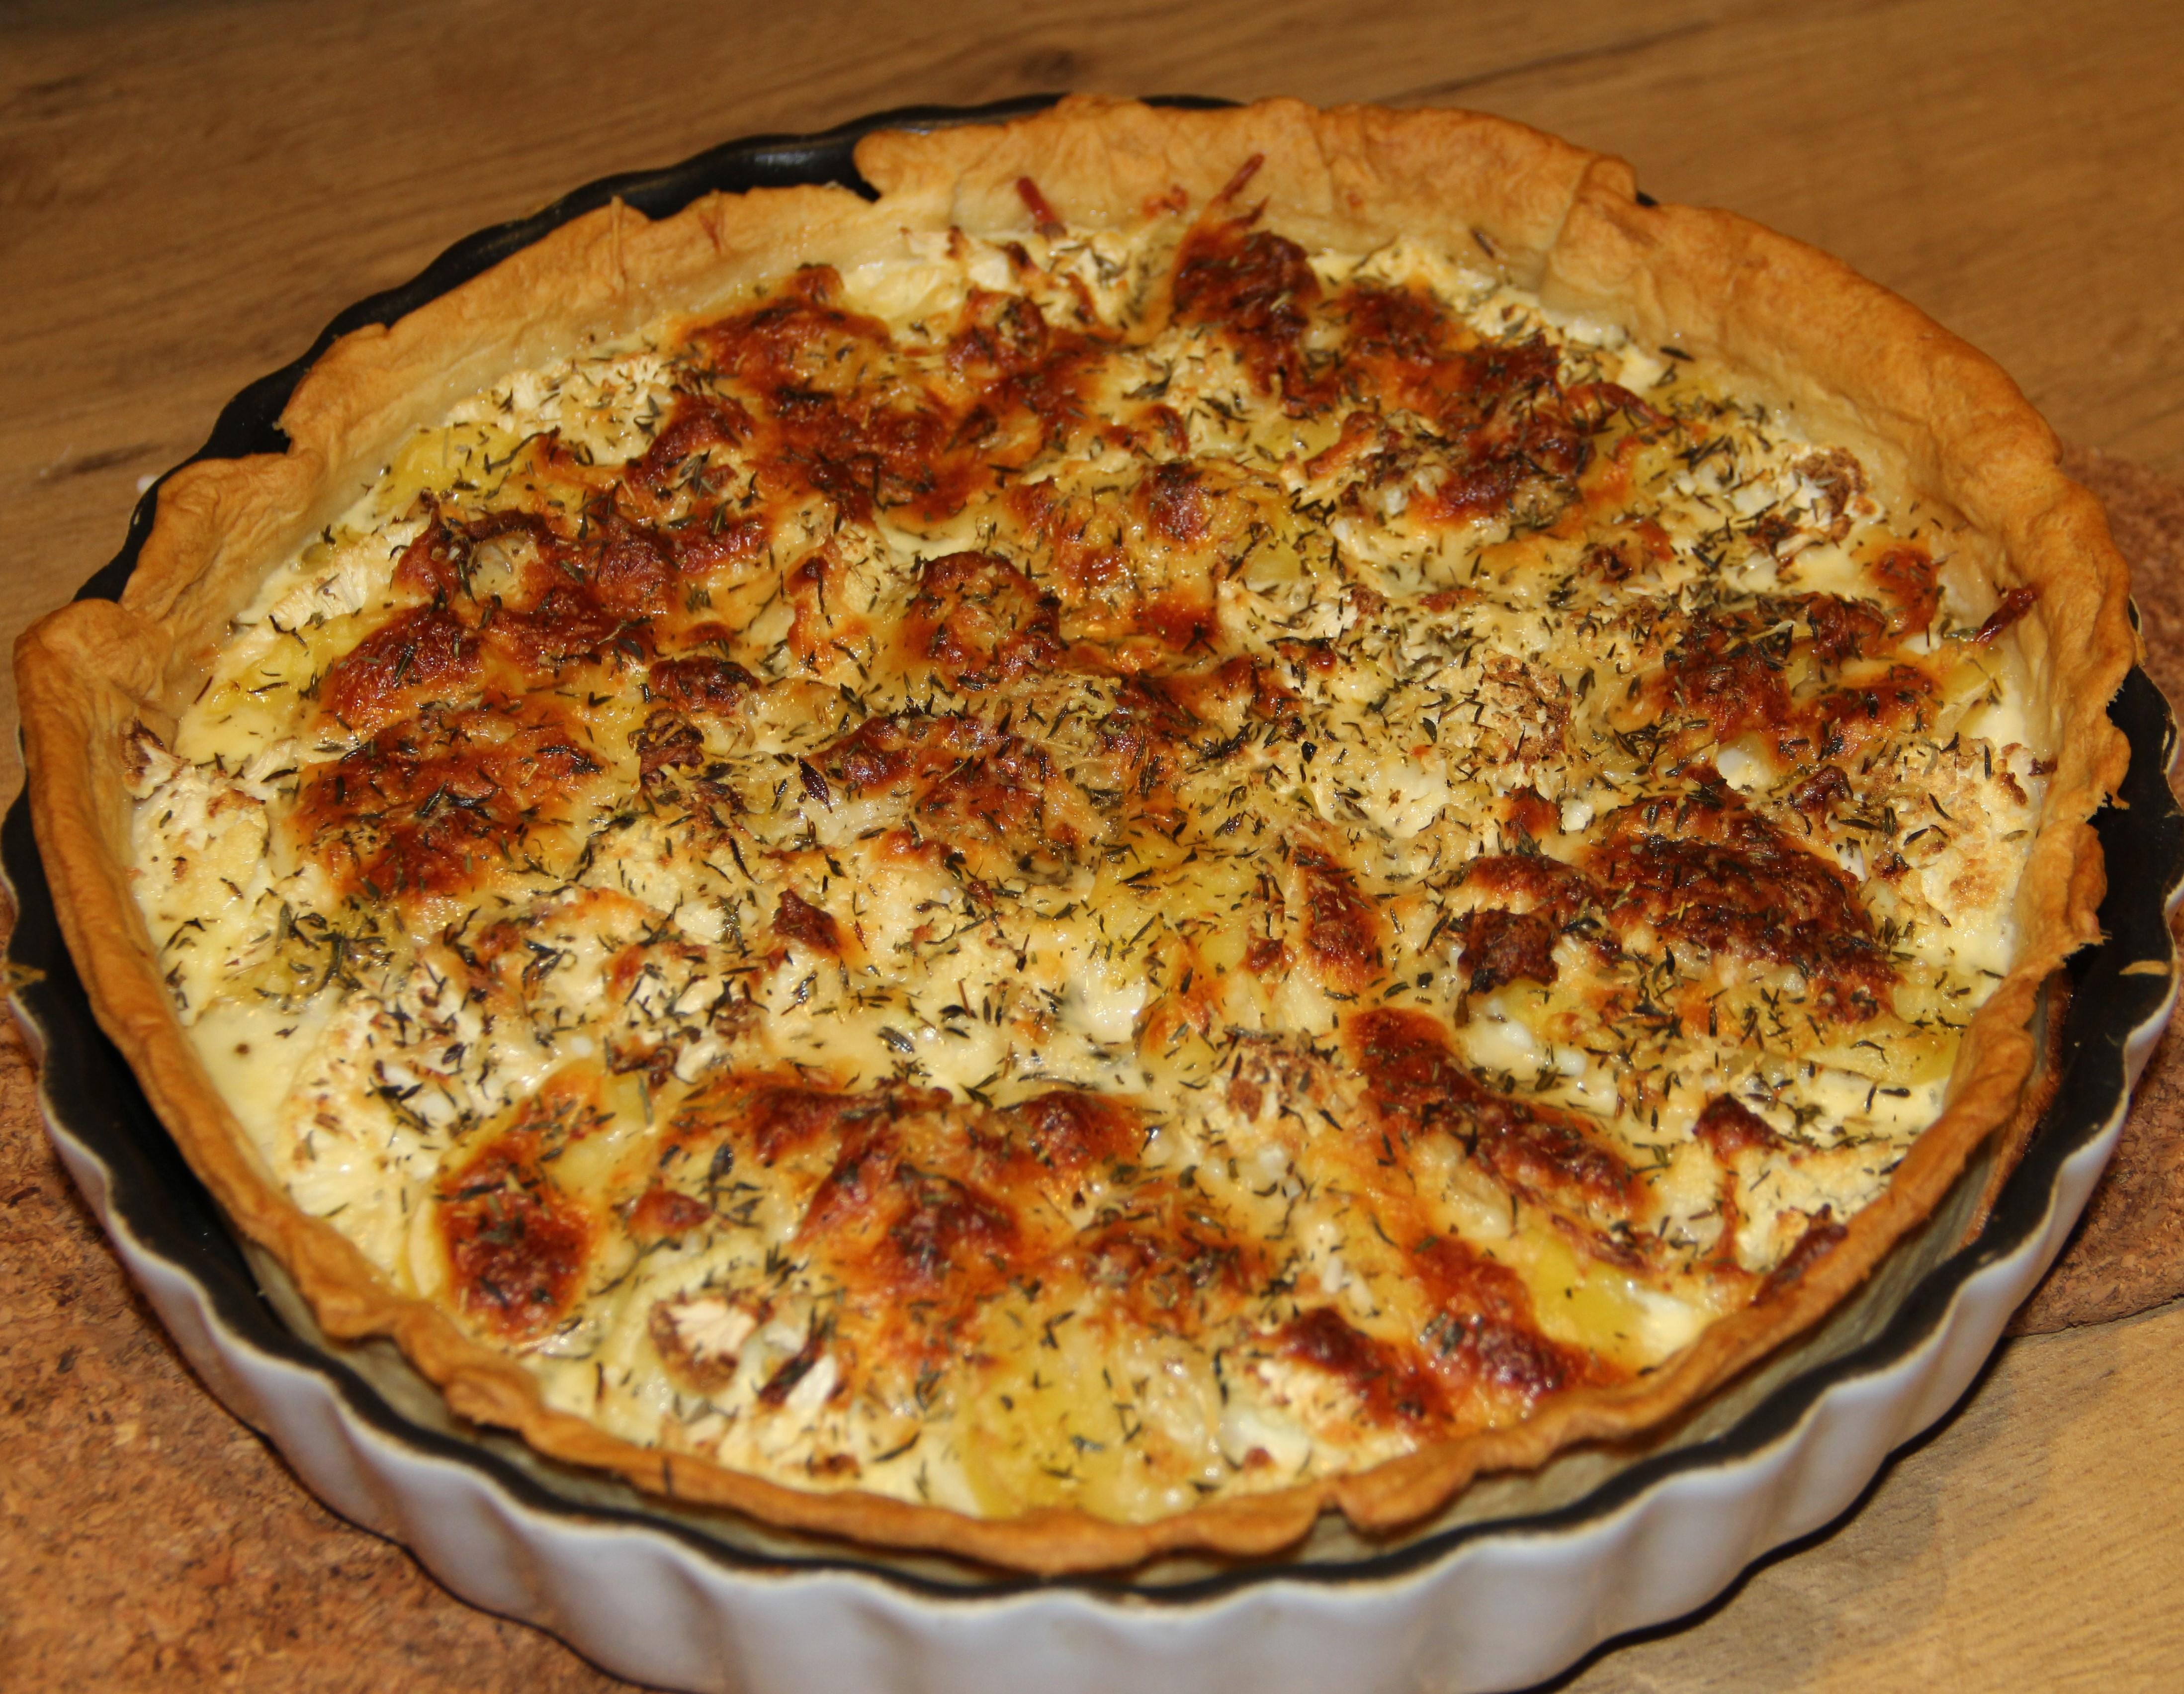 tærte med kartofler og blomkål